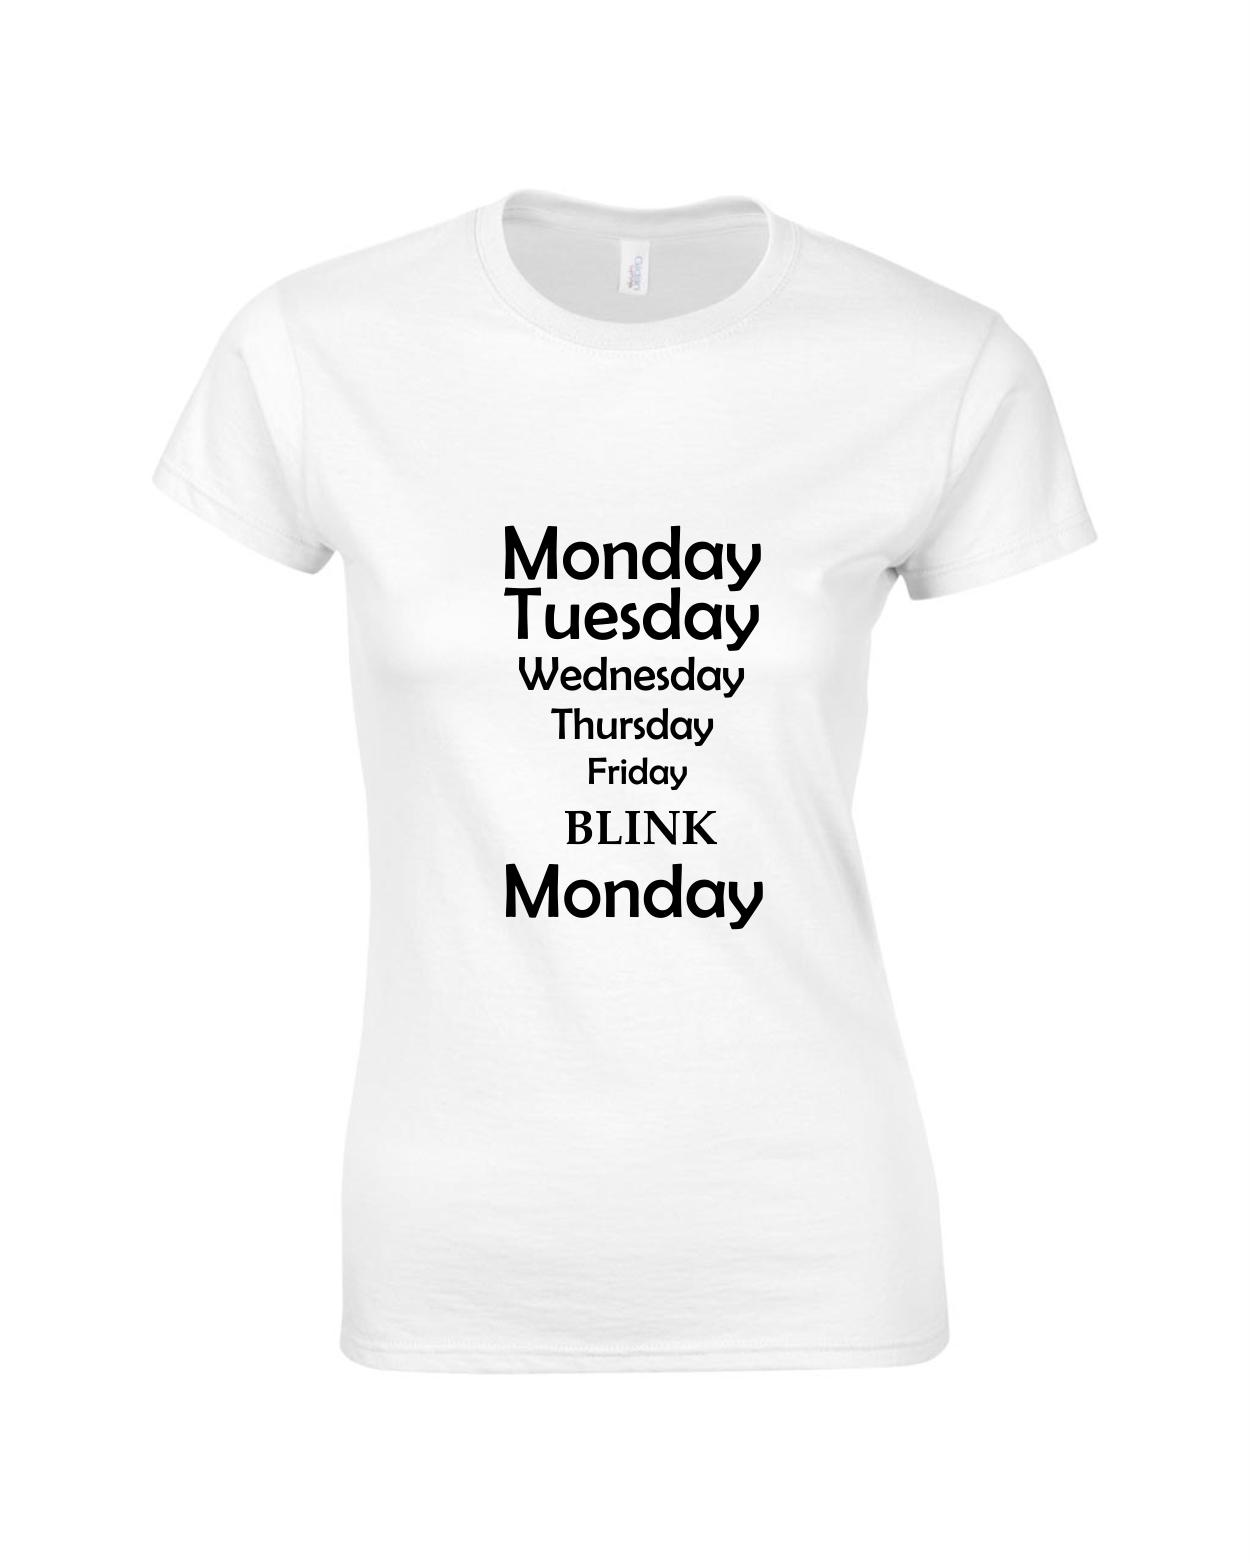 Tricou bumbac dama unisex alb negru imprimat serigrafie Blink